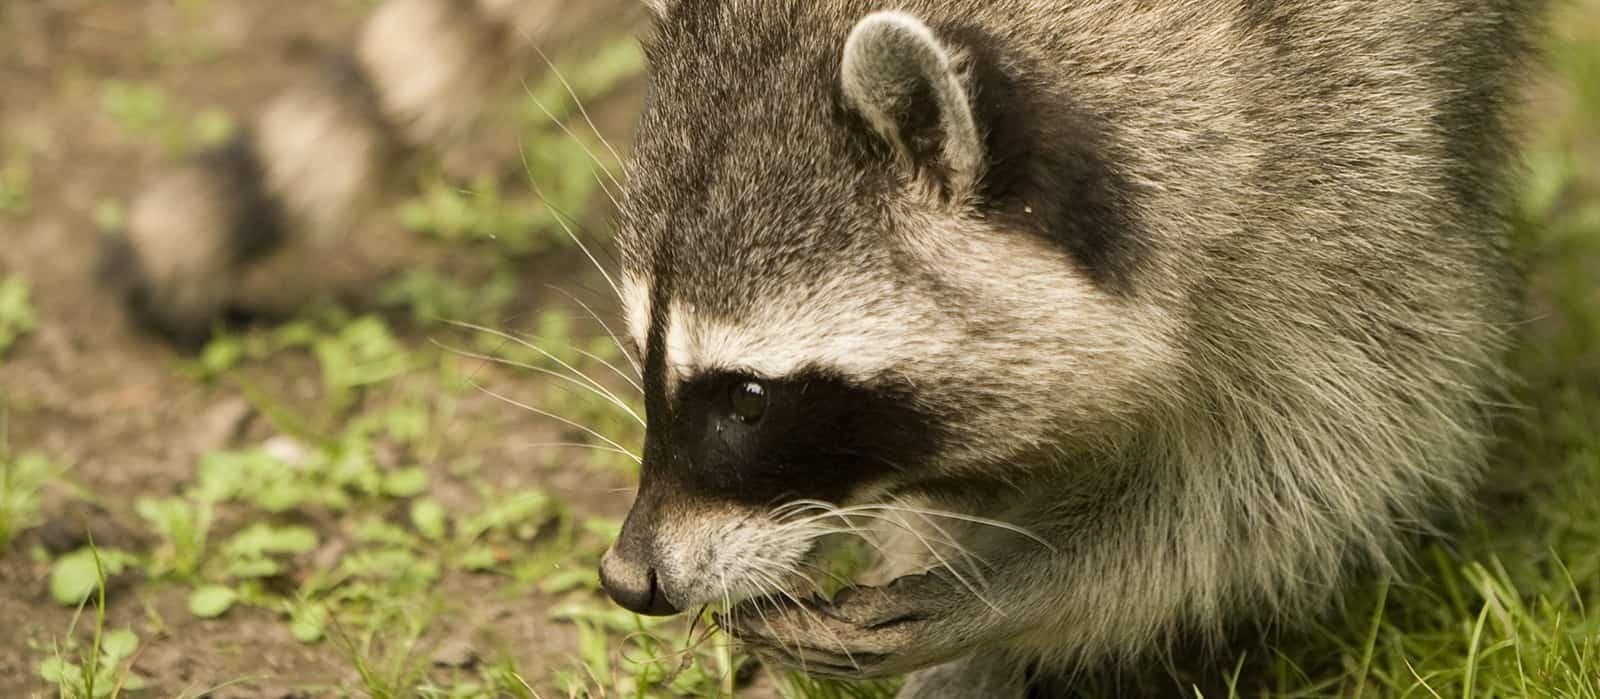 Rodent Wildlife